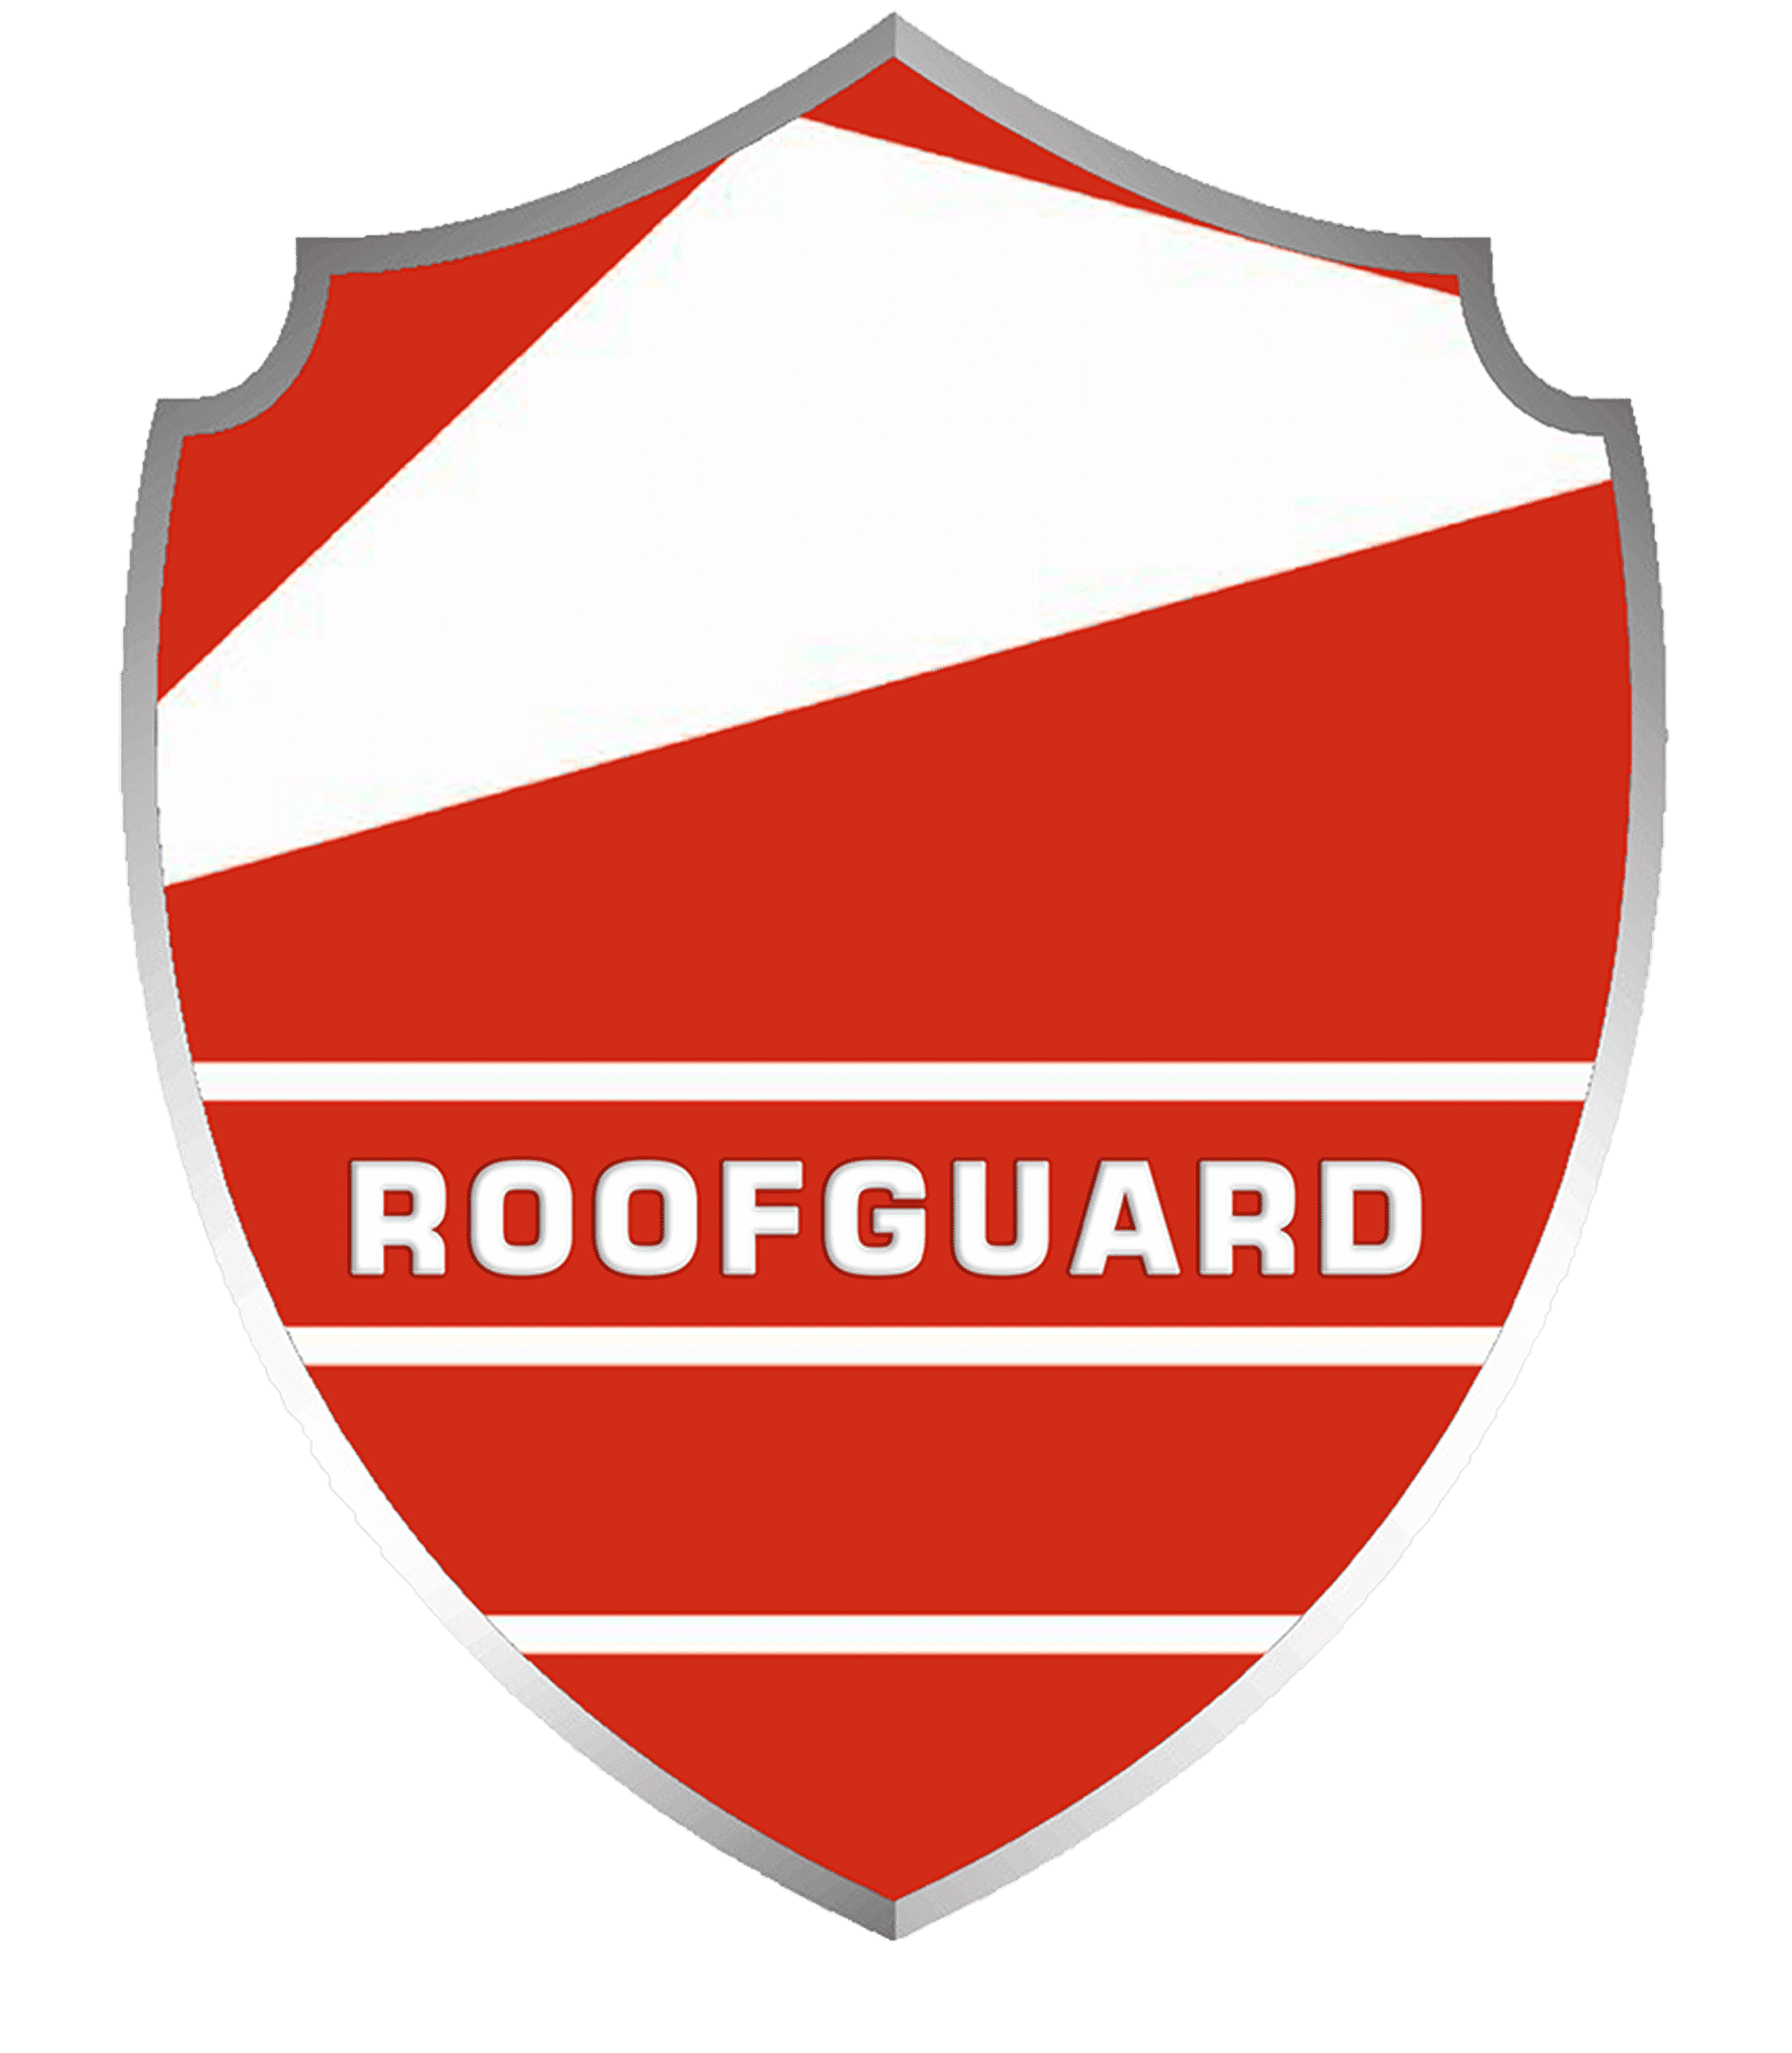 roofguard-final-trans-min.png